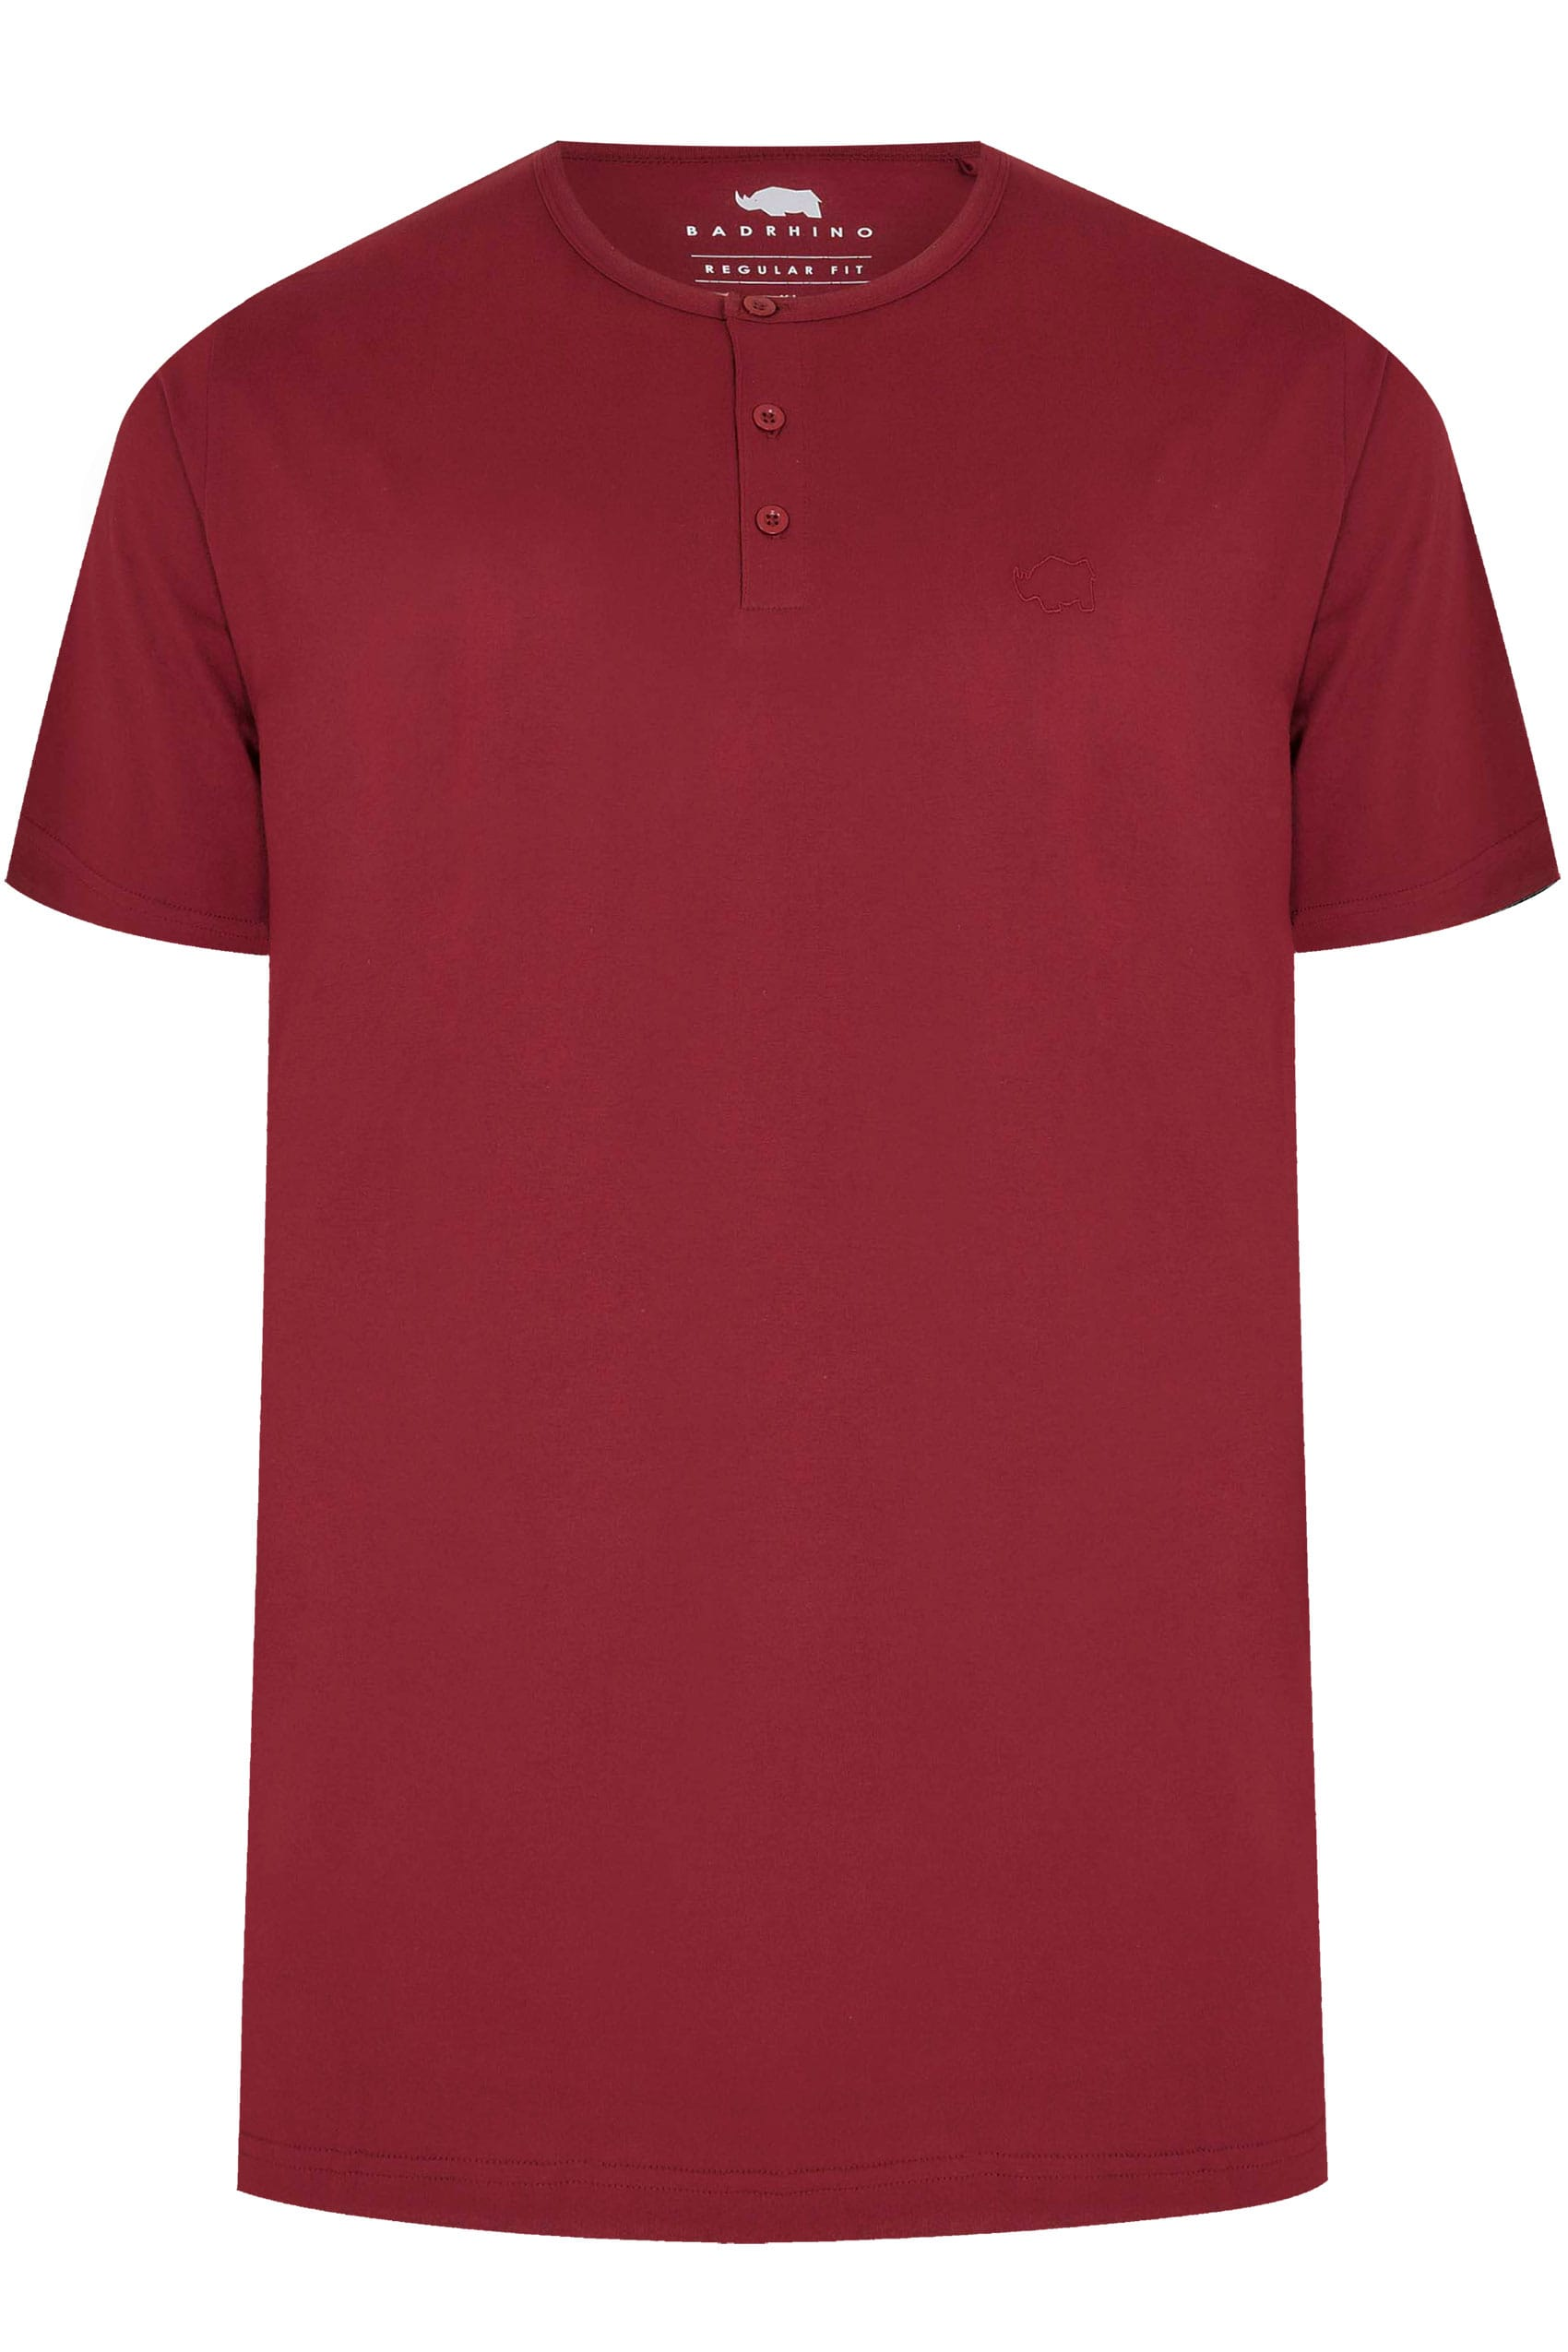 BadRhino Burgundy Short Sleeve Grandad T-Shirt